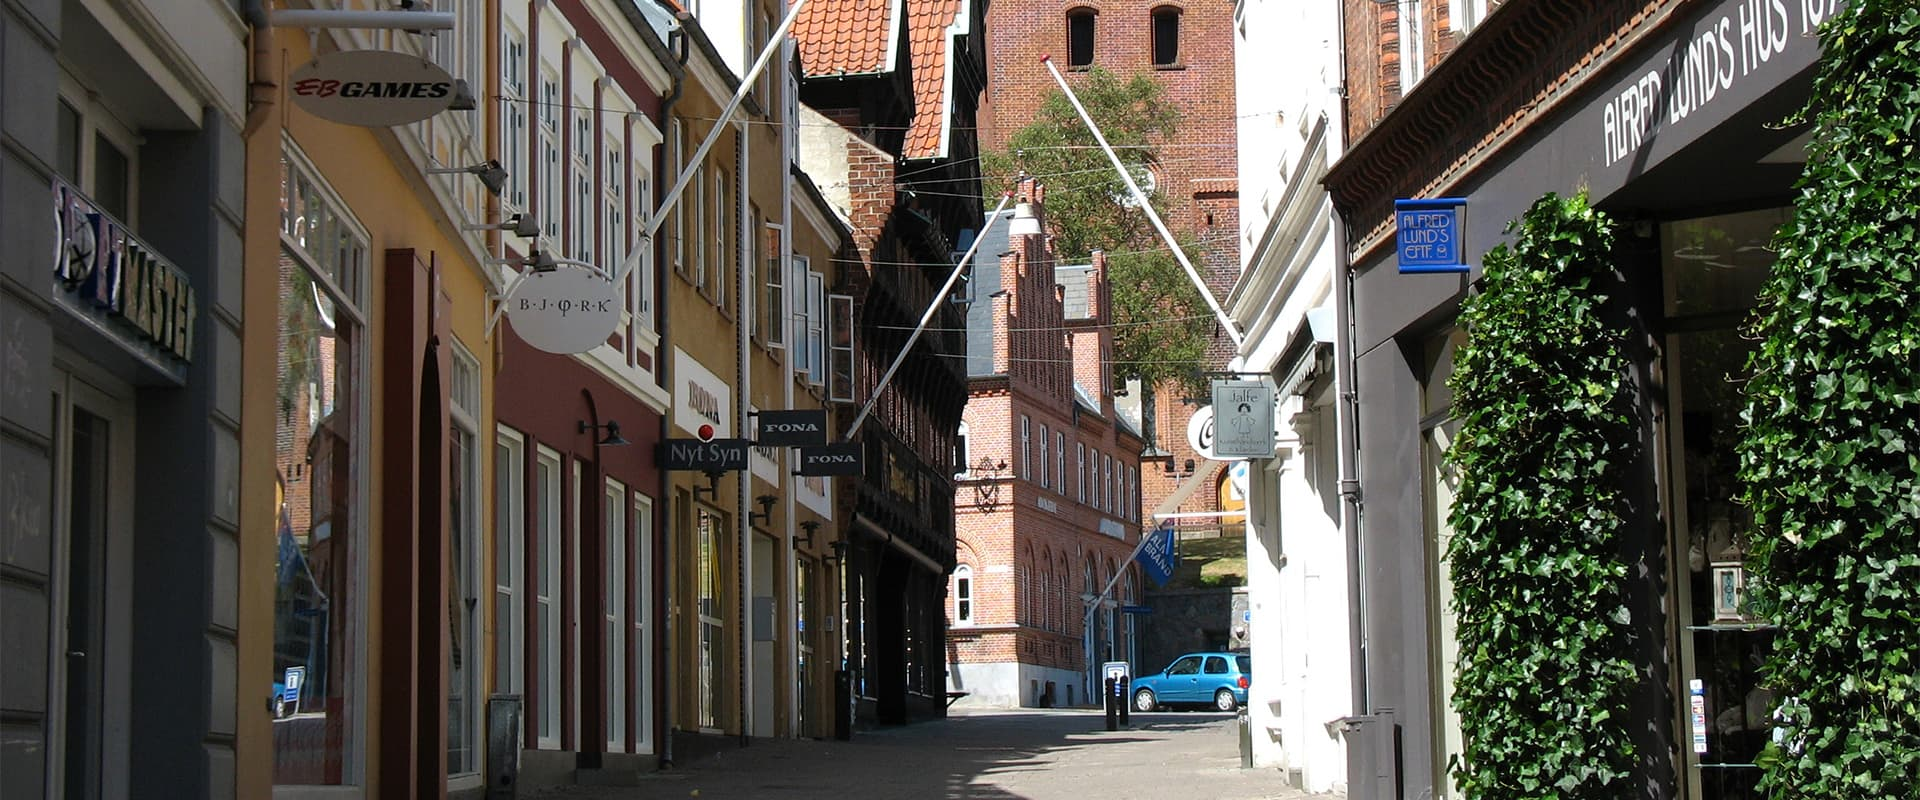 Svendborg Taxa